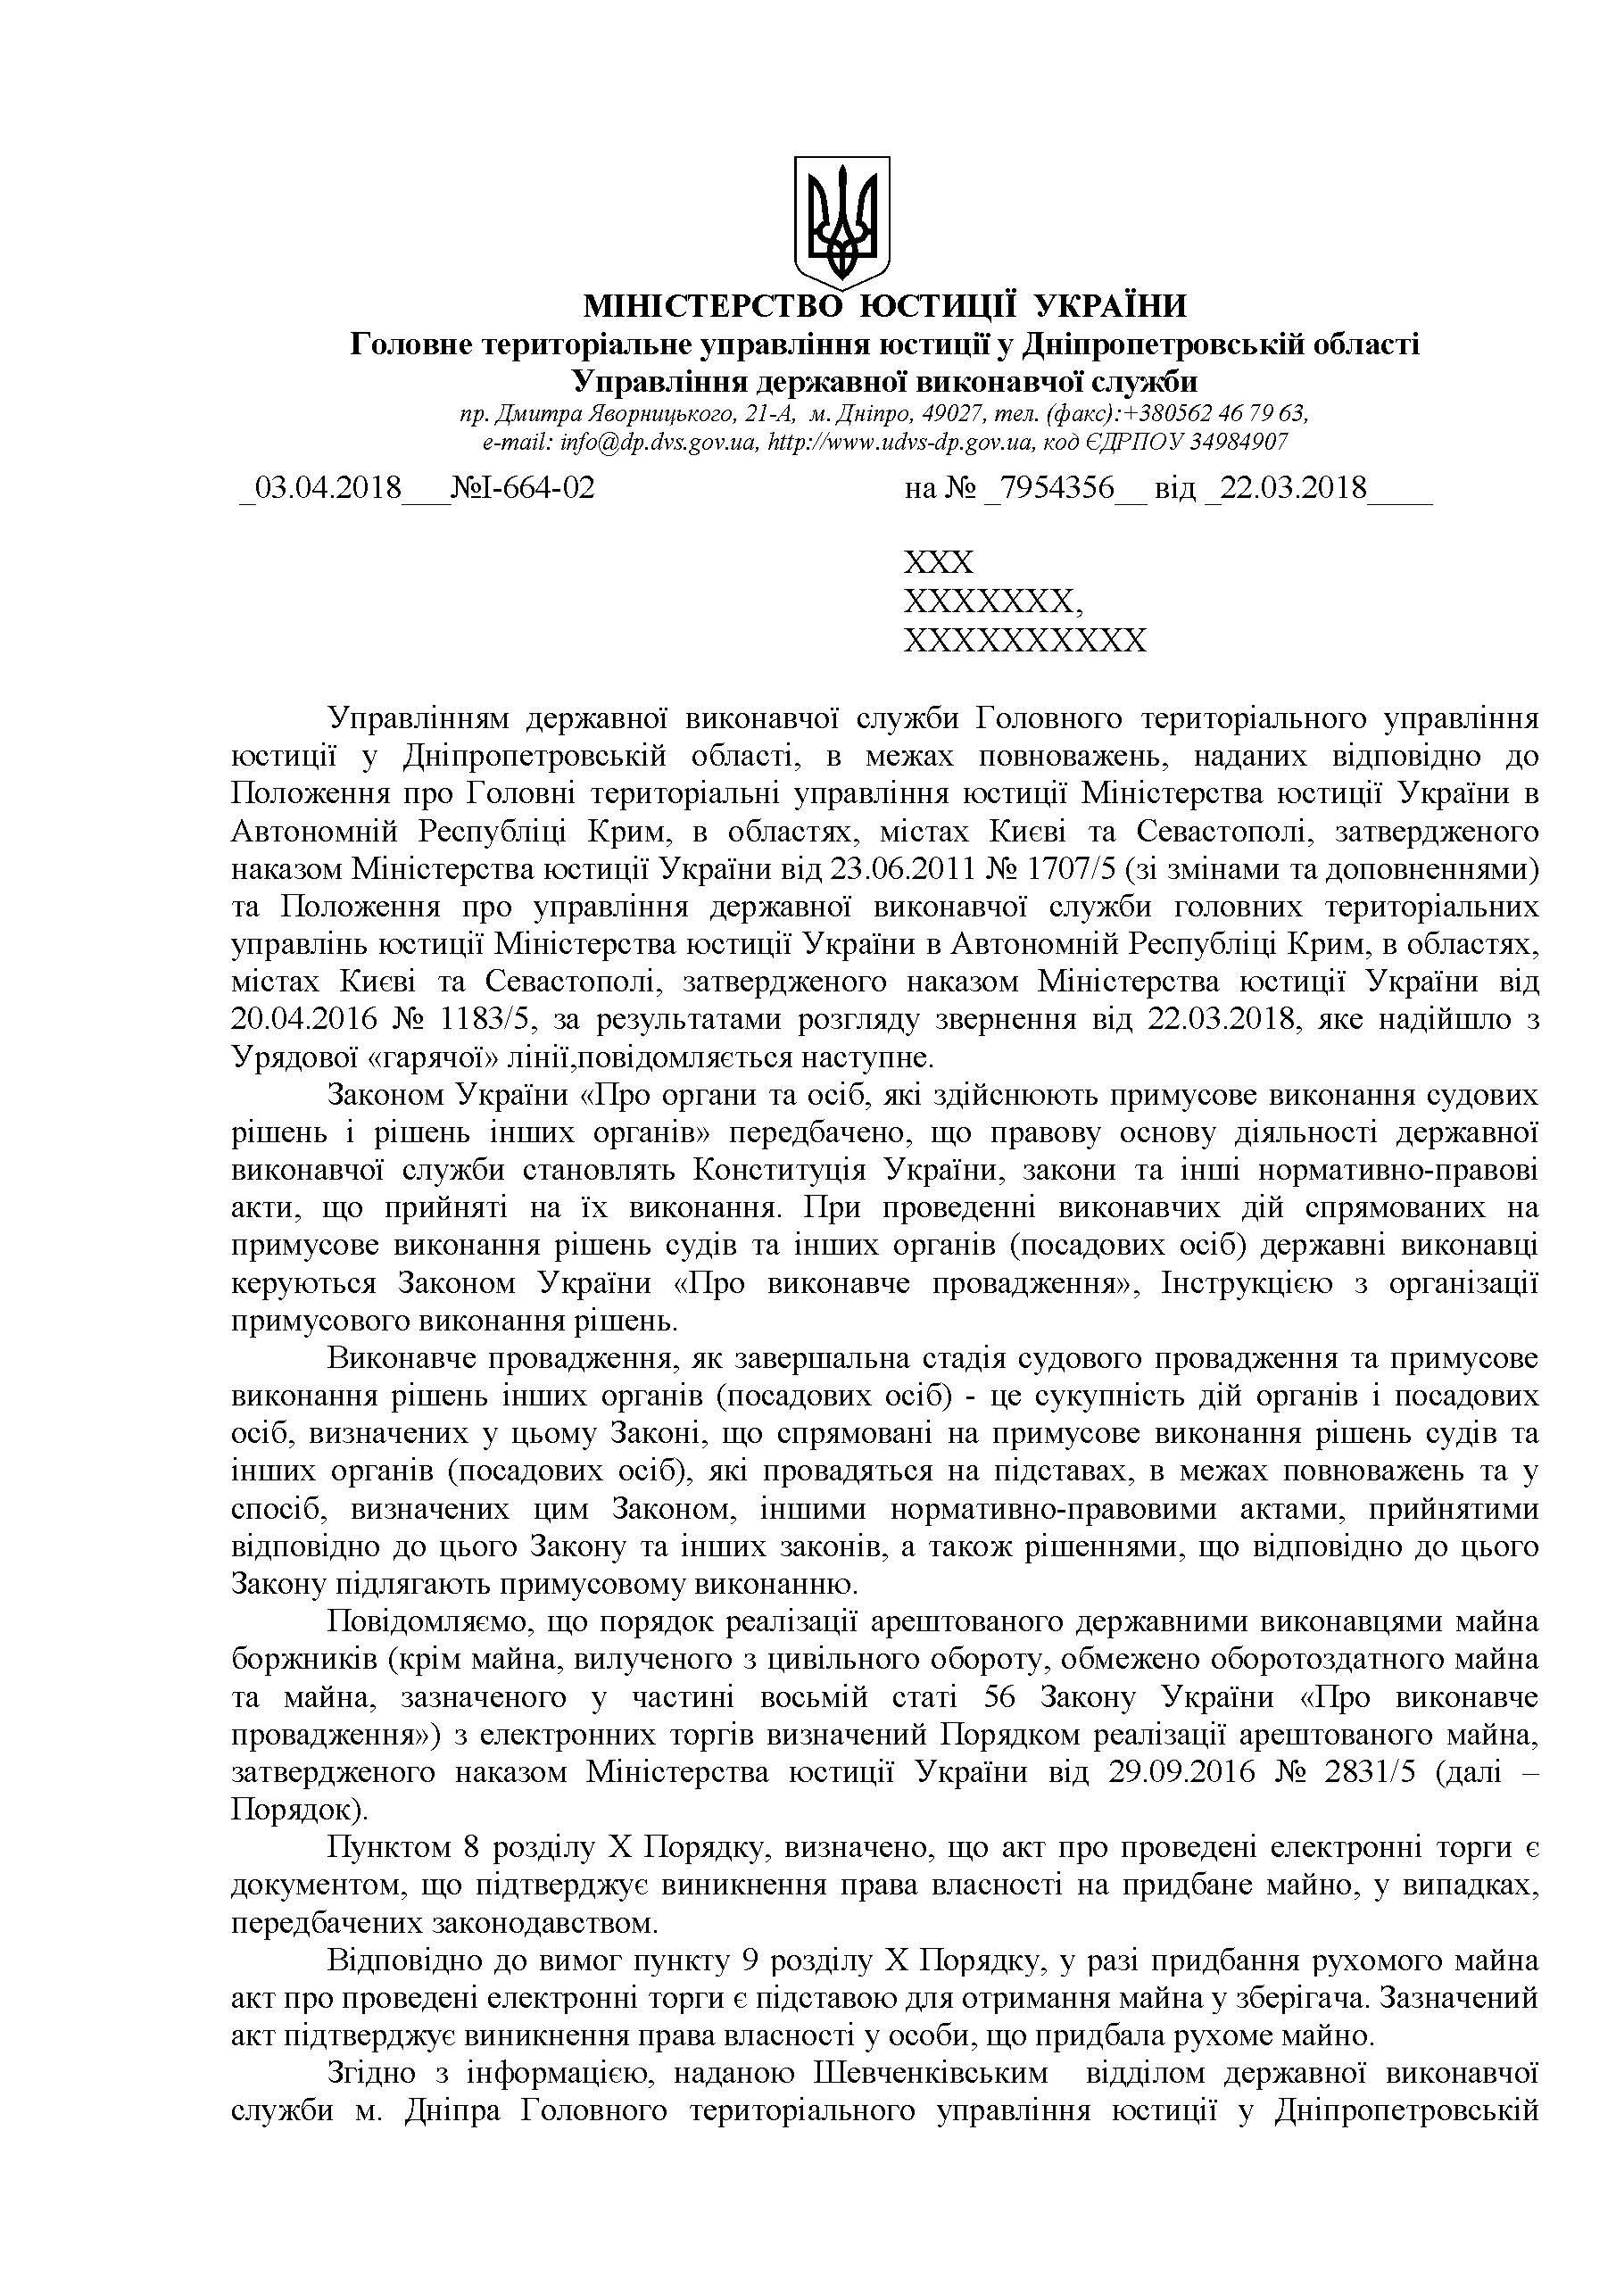 image http://forum.setam.net.ua/assets/images/446-f8HankYU6fUlxEL2.jpeg